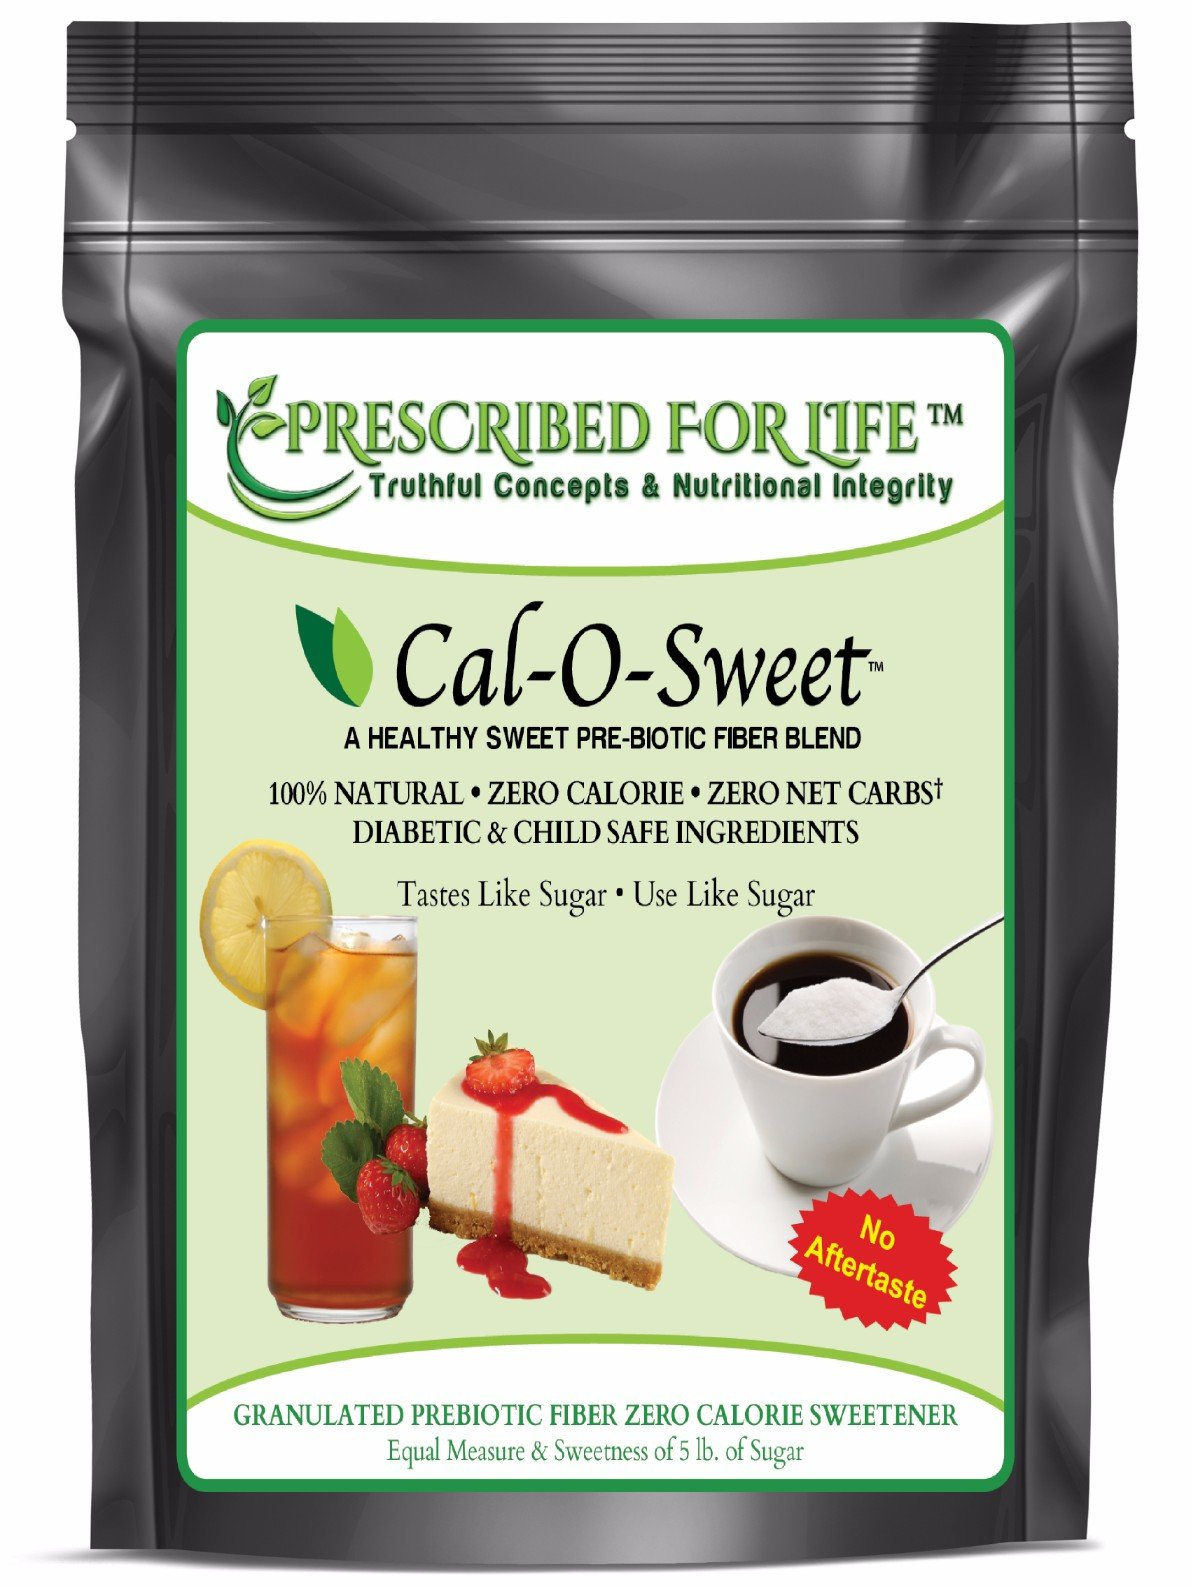 Cal-O-Sweet (TM) - NO-Aftertaste All Natural Zero Calorie & Carb Sugar-Free Sweetener & Pre-Biotic Fiber, 50 lb